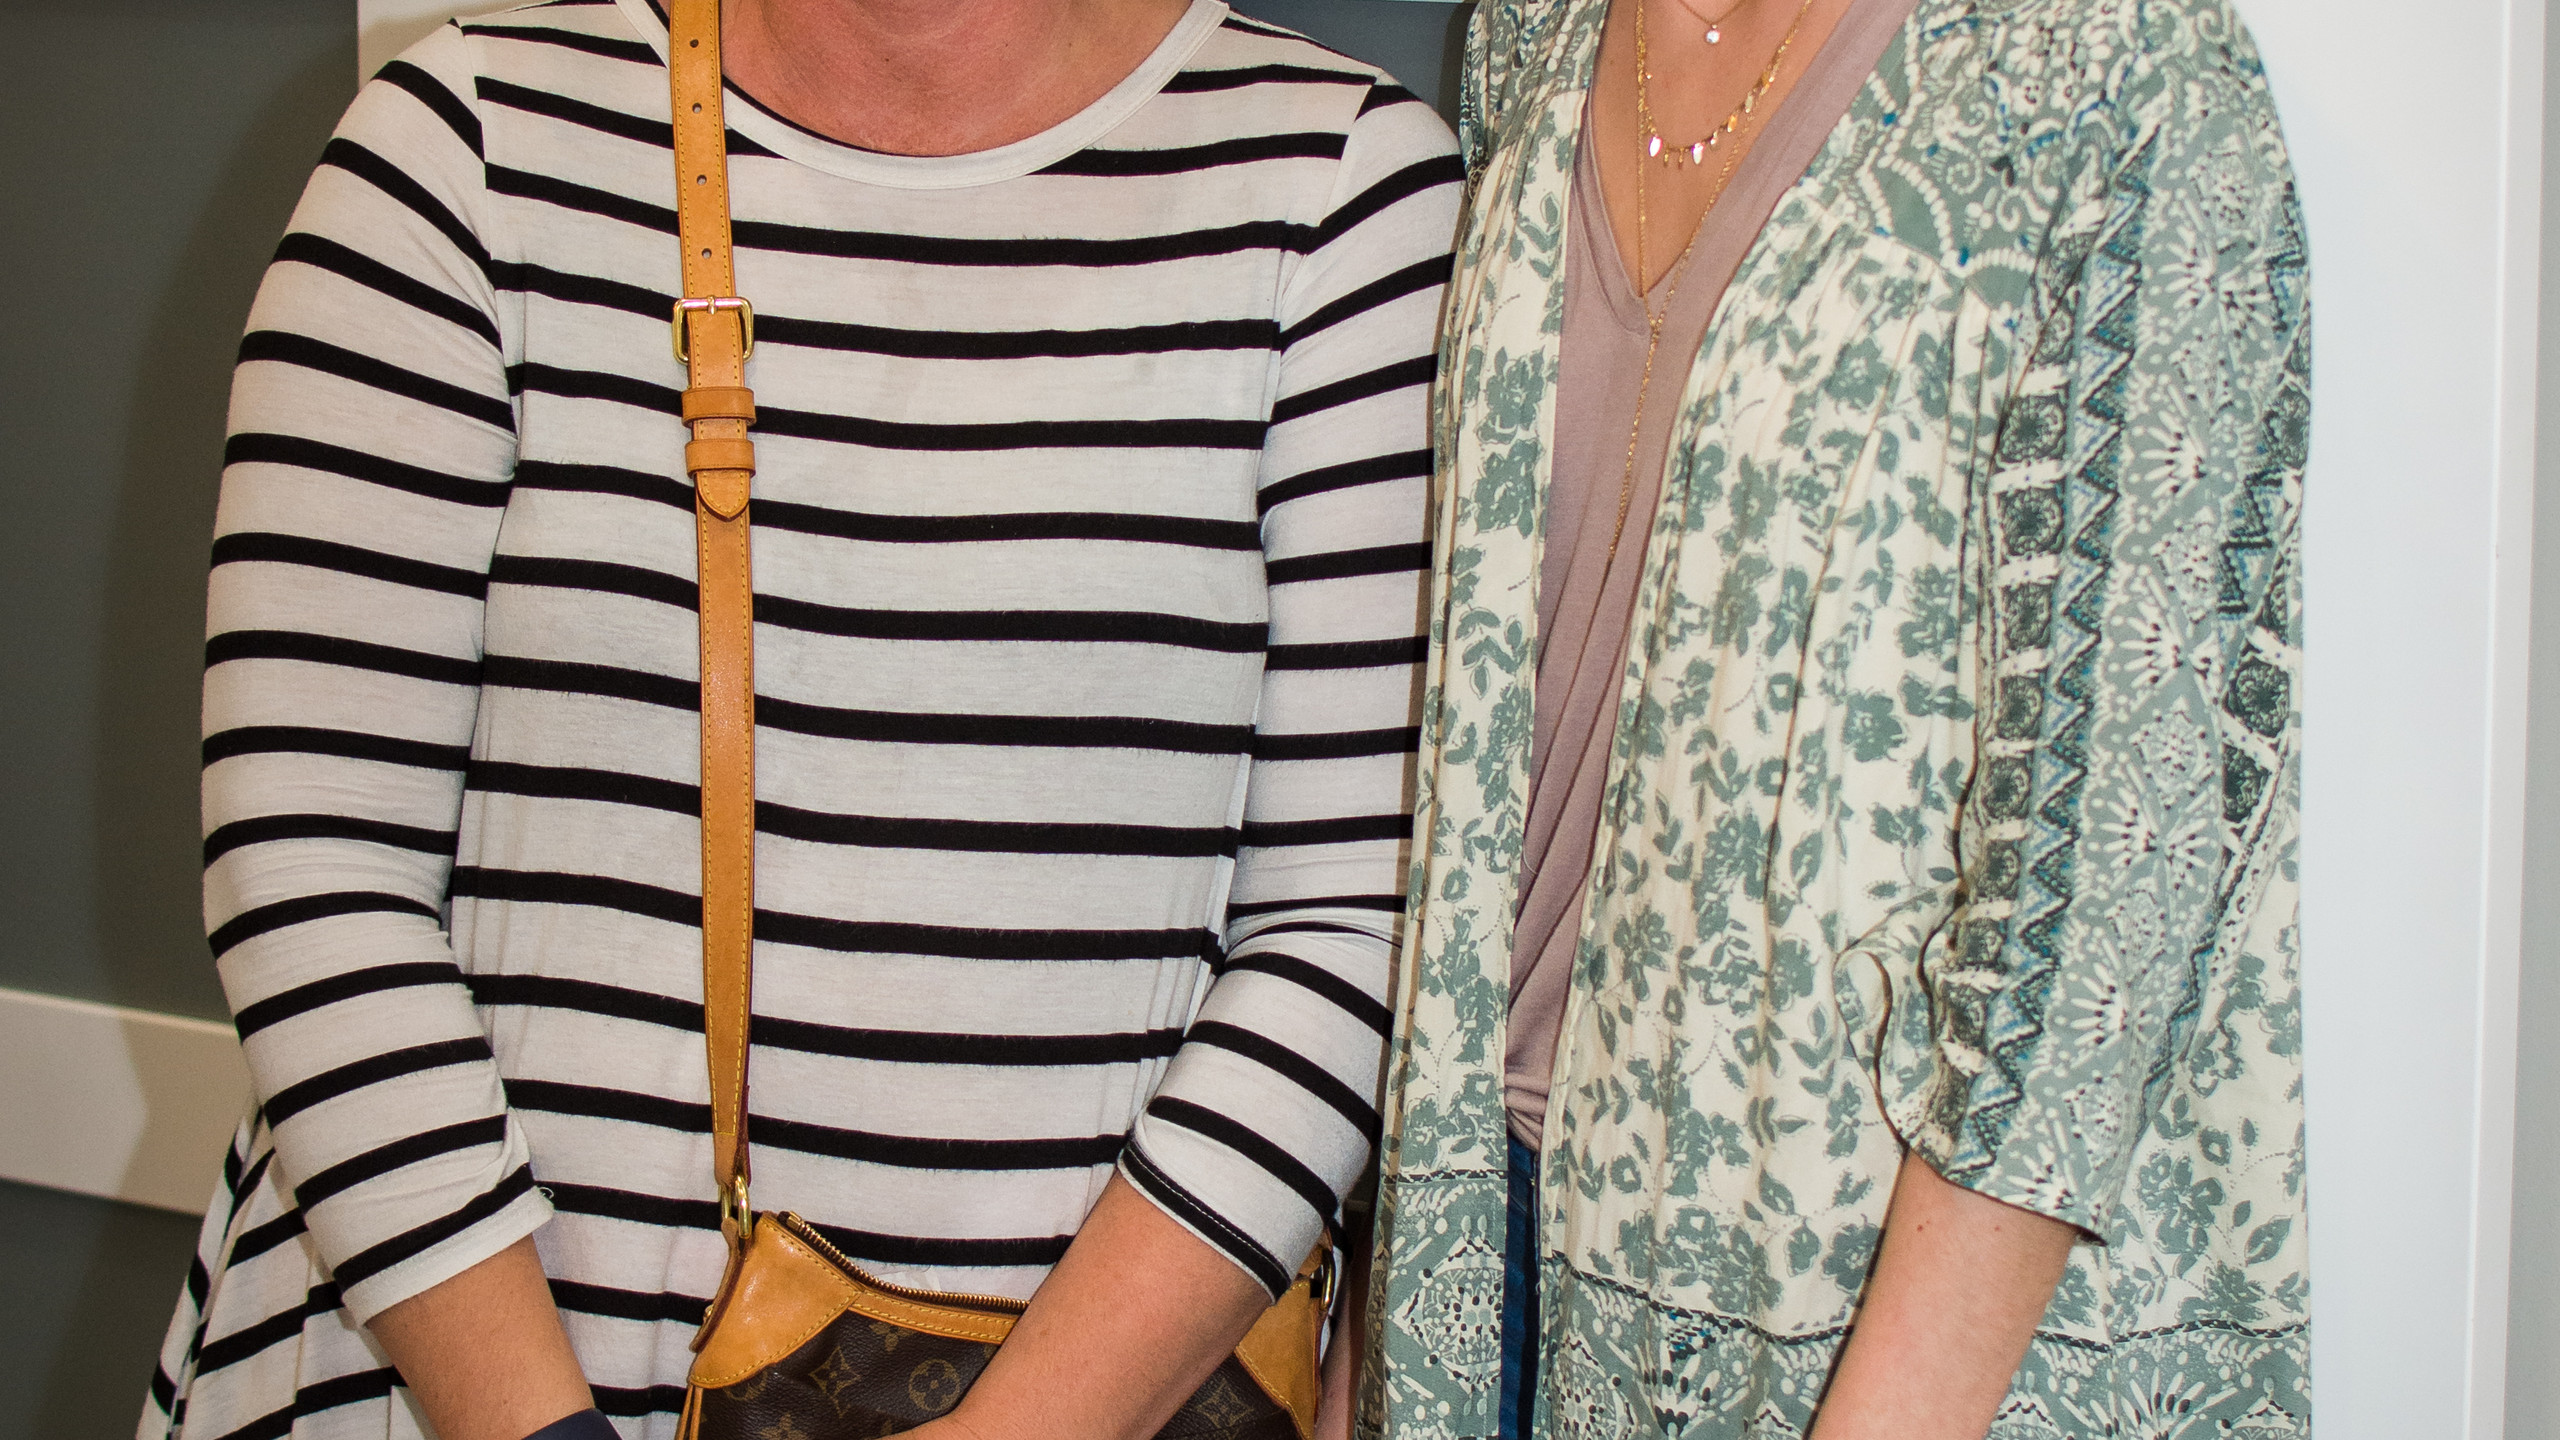 Emily Sykes and Melanie Wojnarek